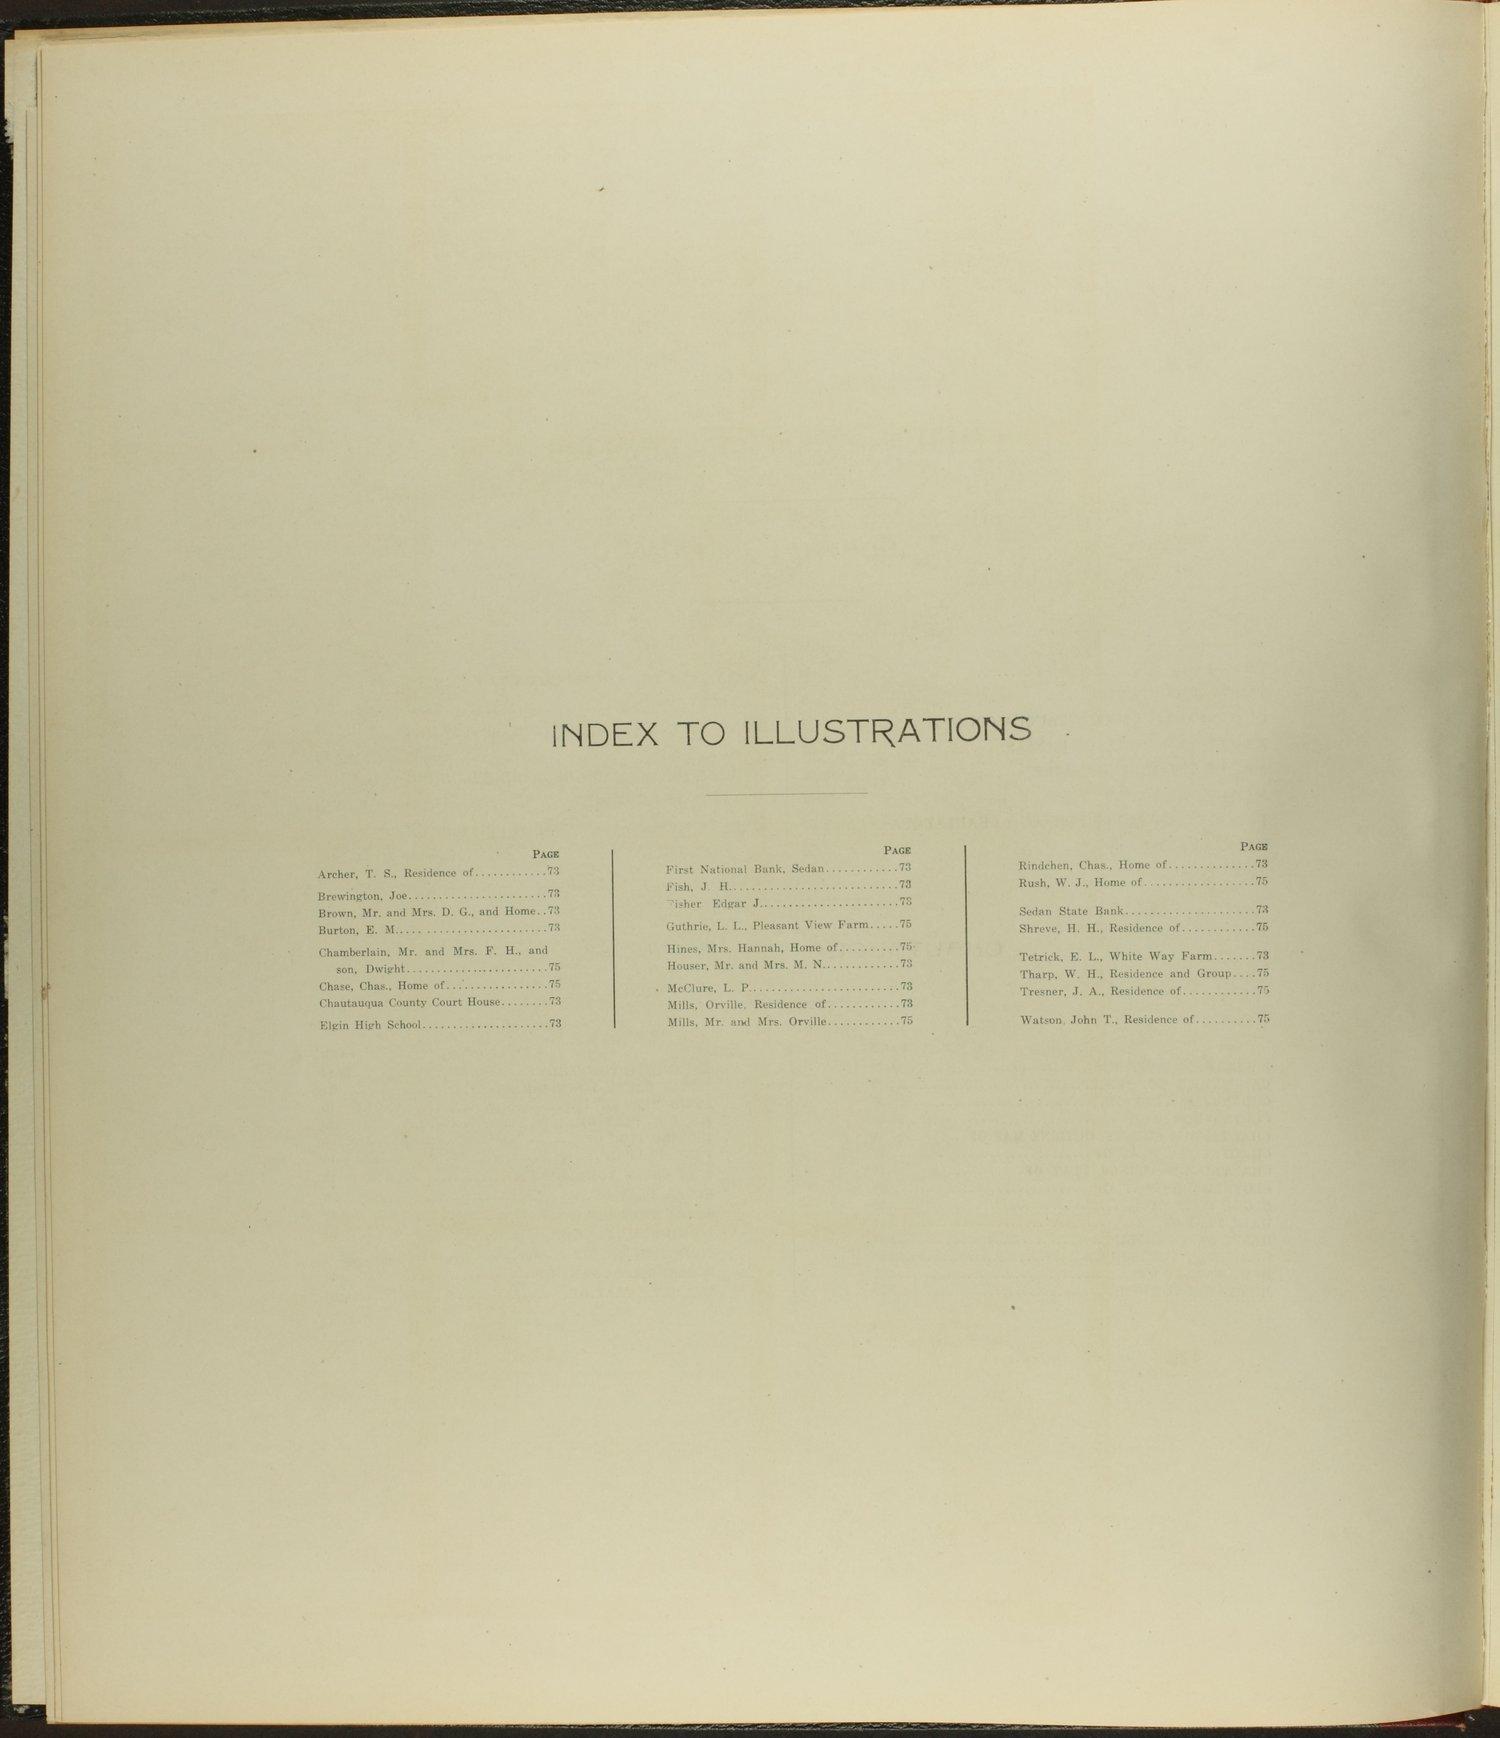 Standard atlas of Chautauqua County, Kansas - Index to Illustrations